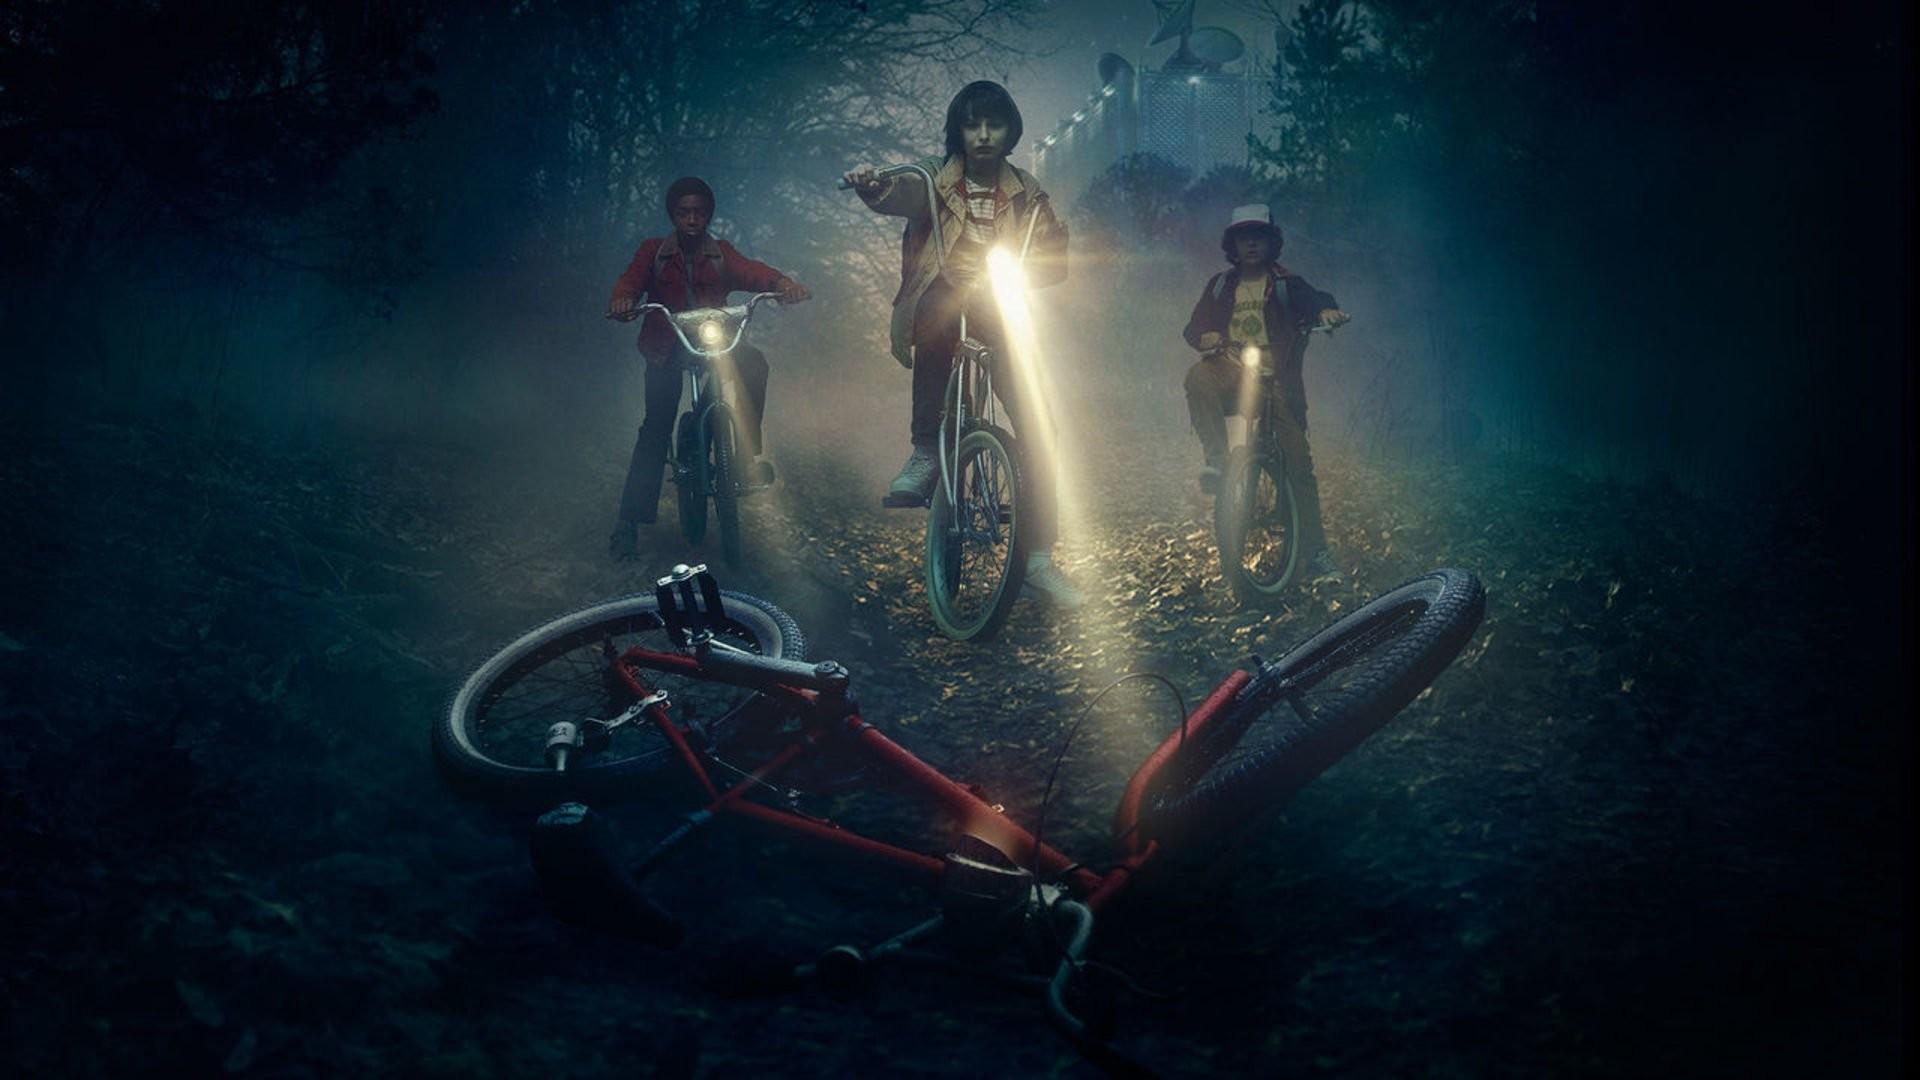 Stranger things fondo bicicleta.jpg